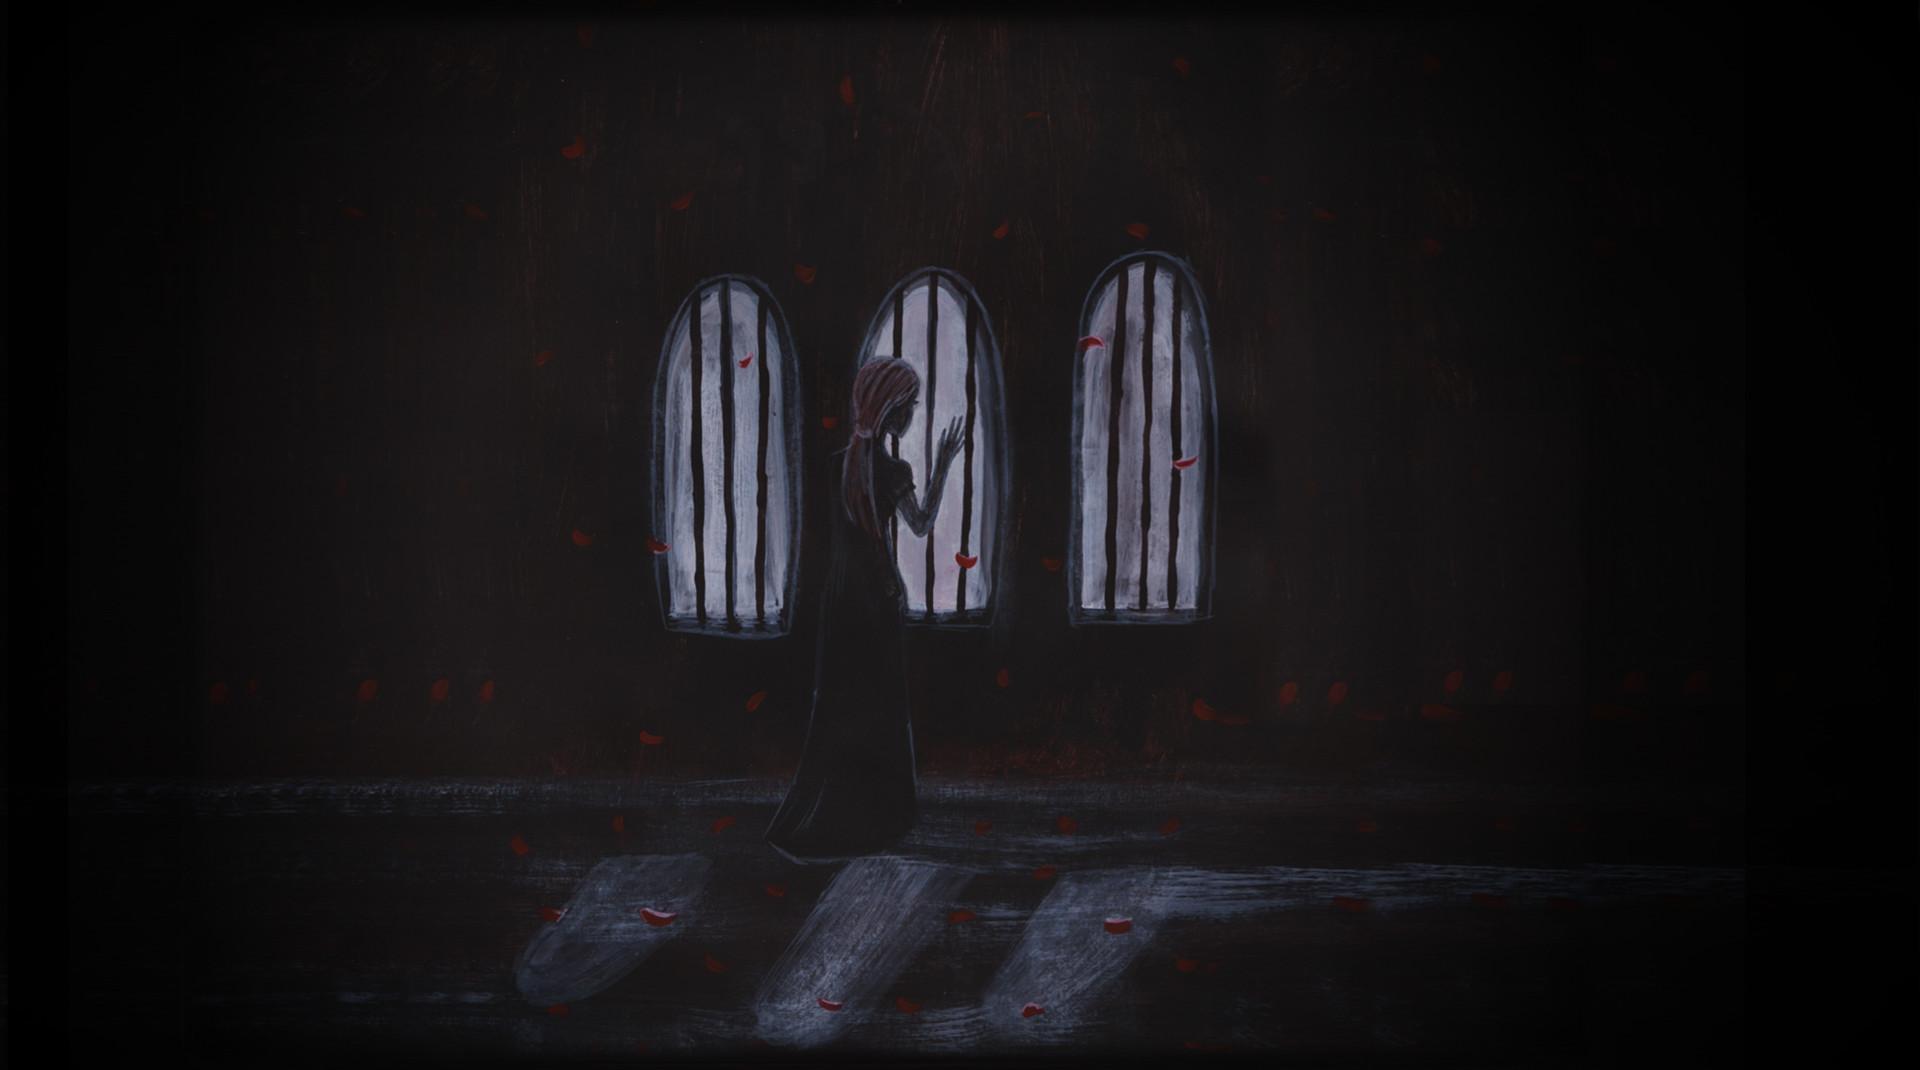 Akai shoku dark church ult finale